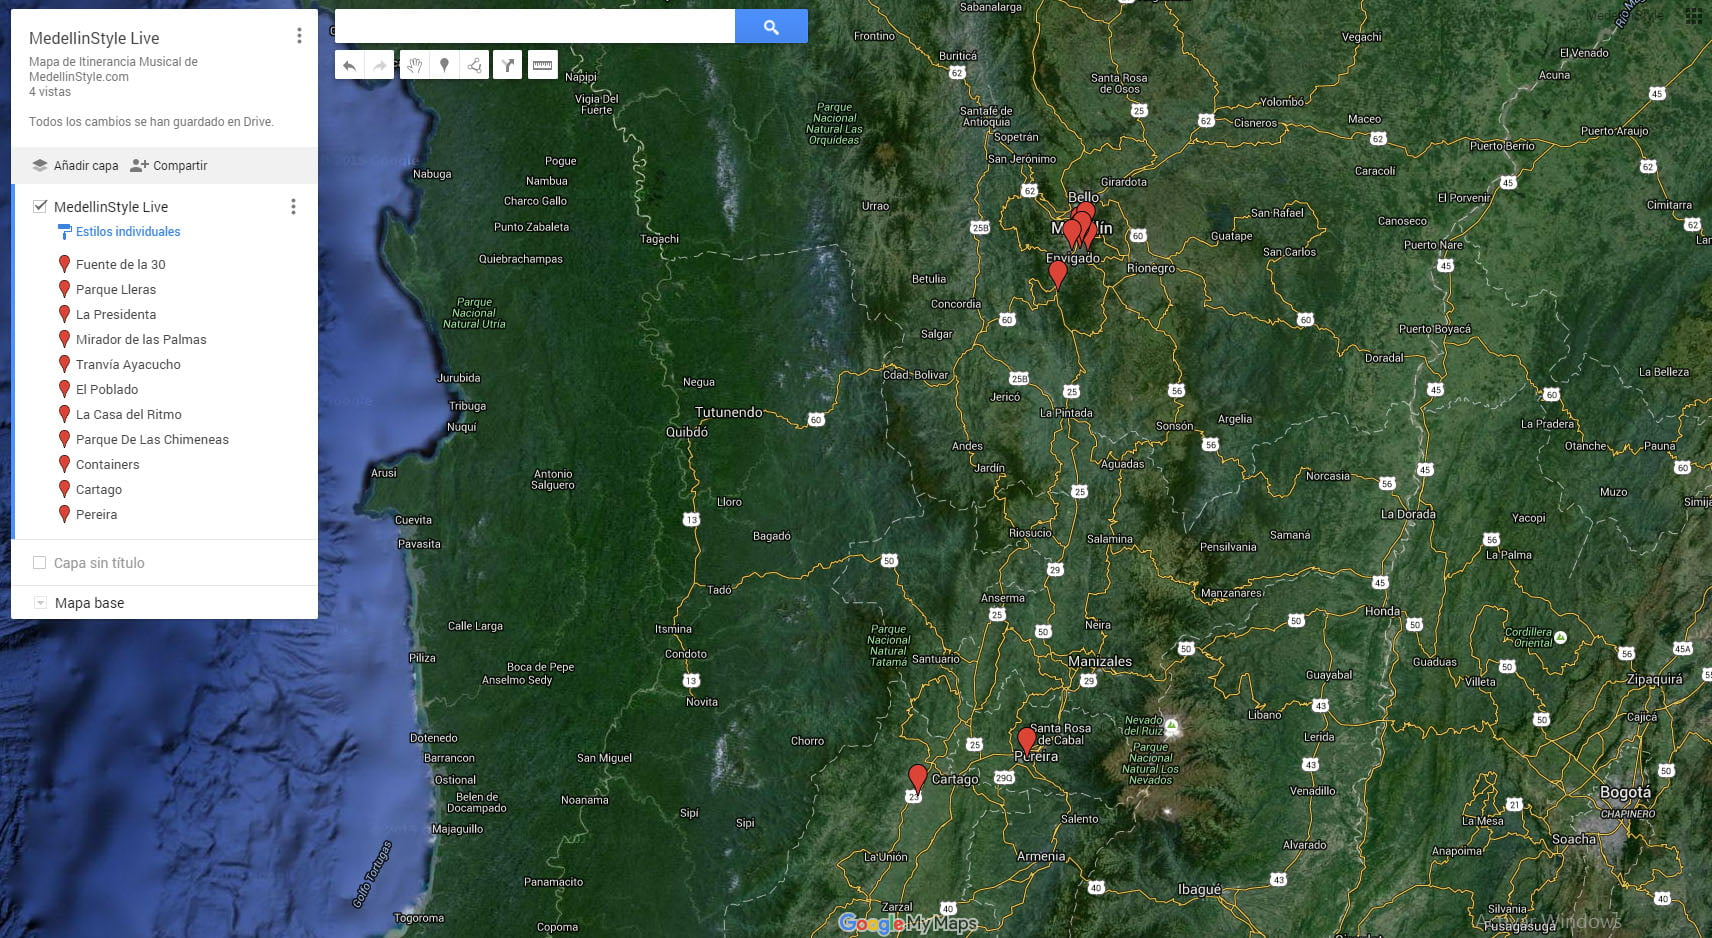 MedellinStyle Live: Mapa de Música ITINERANTE